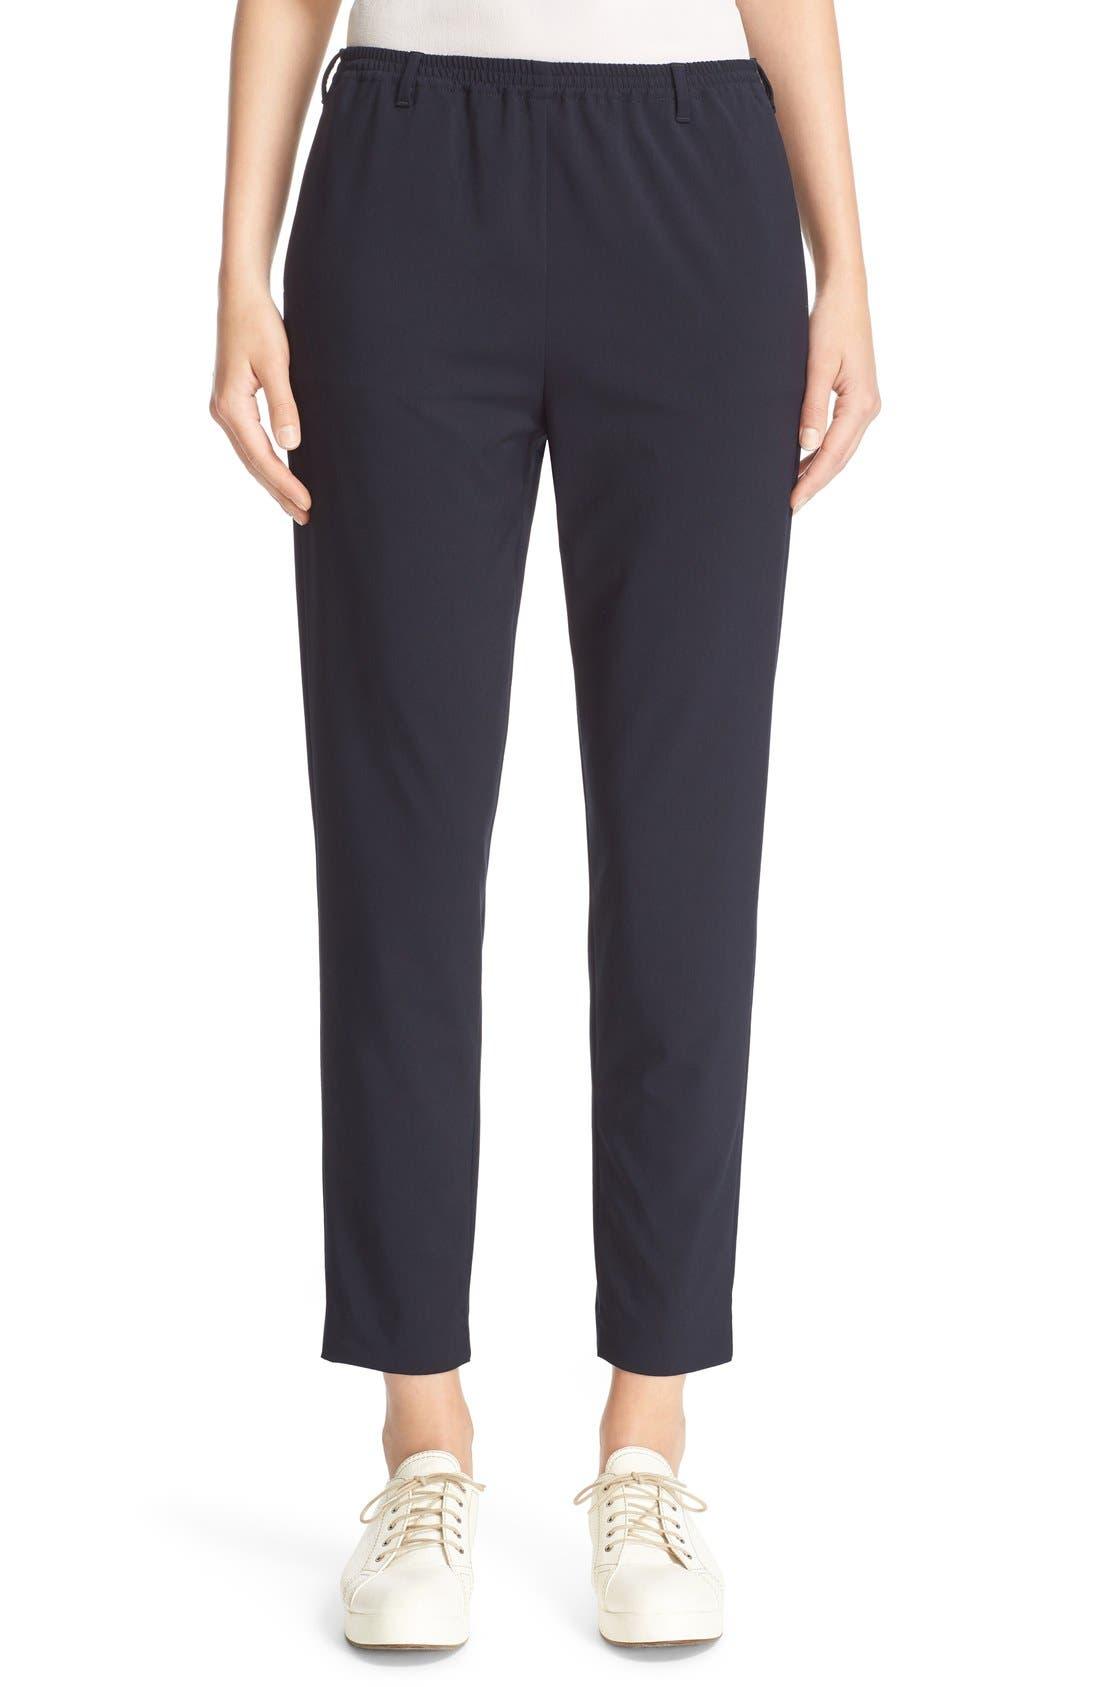 ARMANI COLLEZIONI Armani Jeans Elastic Waist Pants